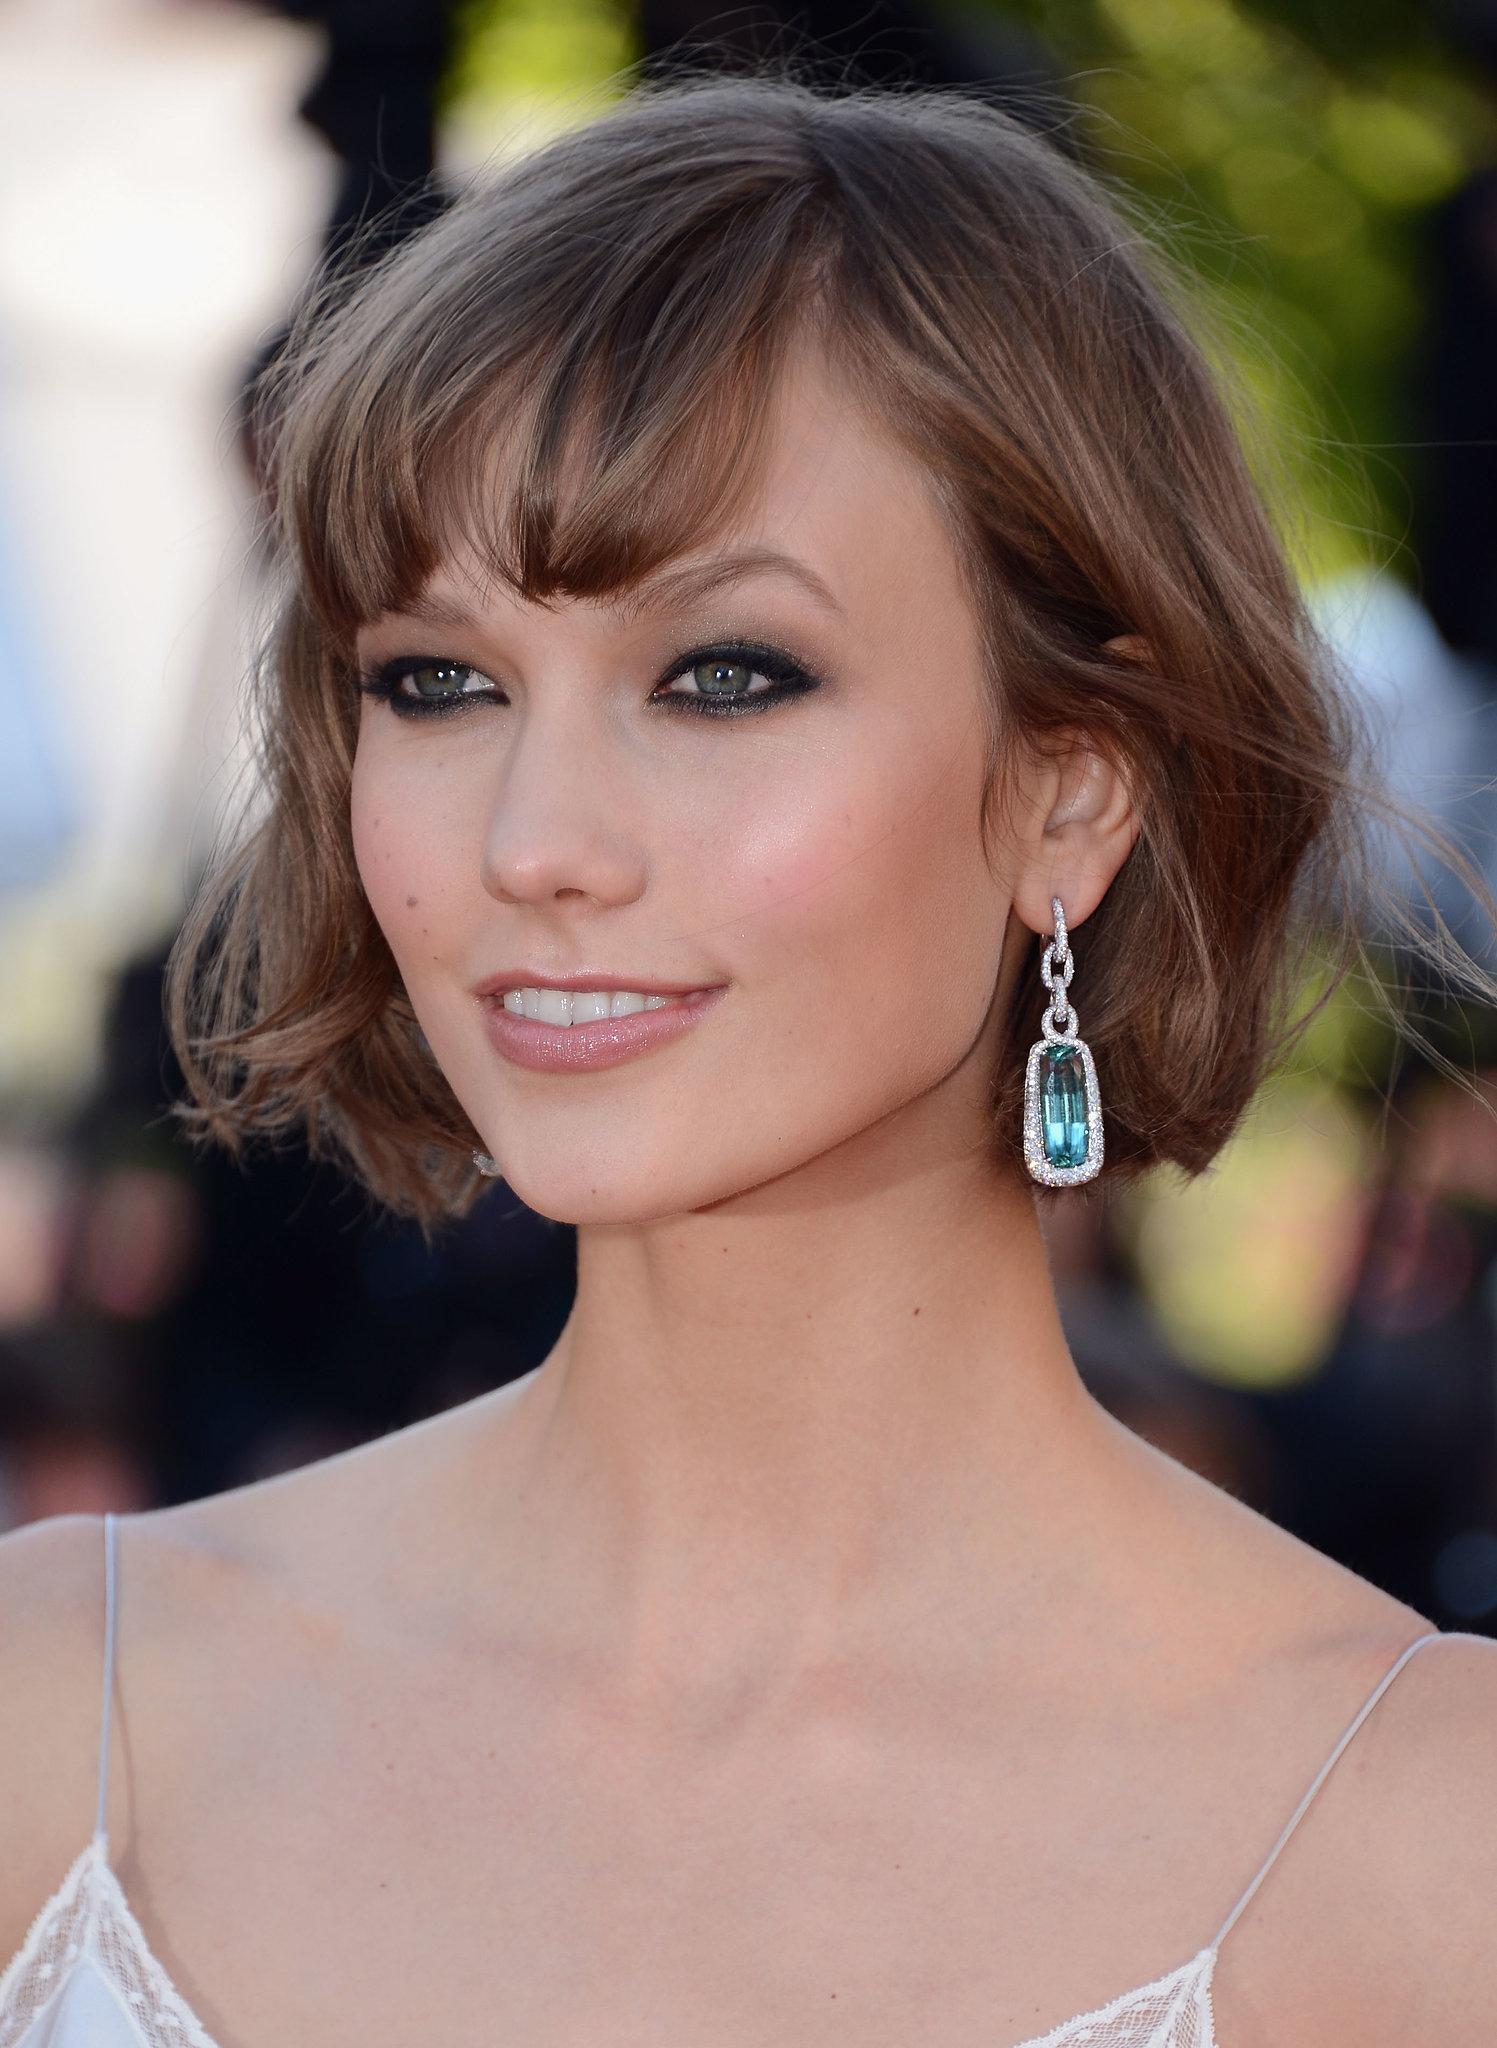 Karlie Kloss wore a pair of aqua-colored gem drop earrings. - Karlie-Kloss-wore-pair-aqua-colored-gem-drop-earrings